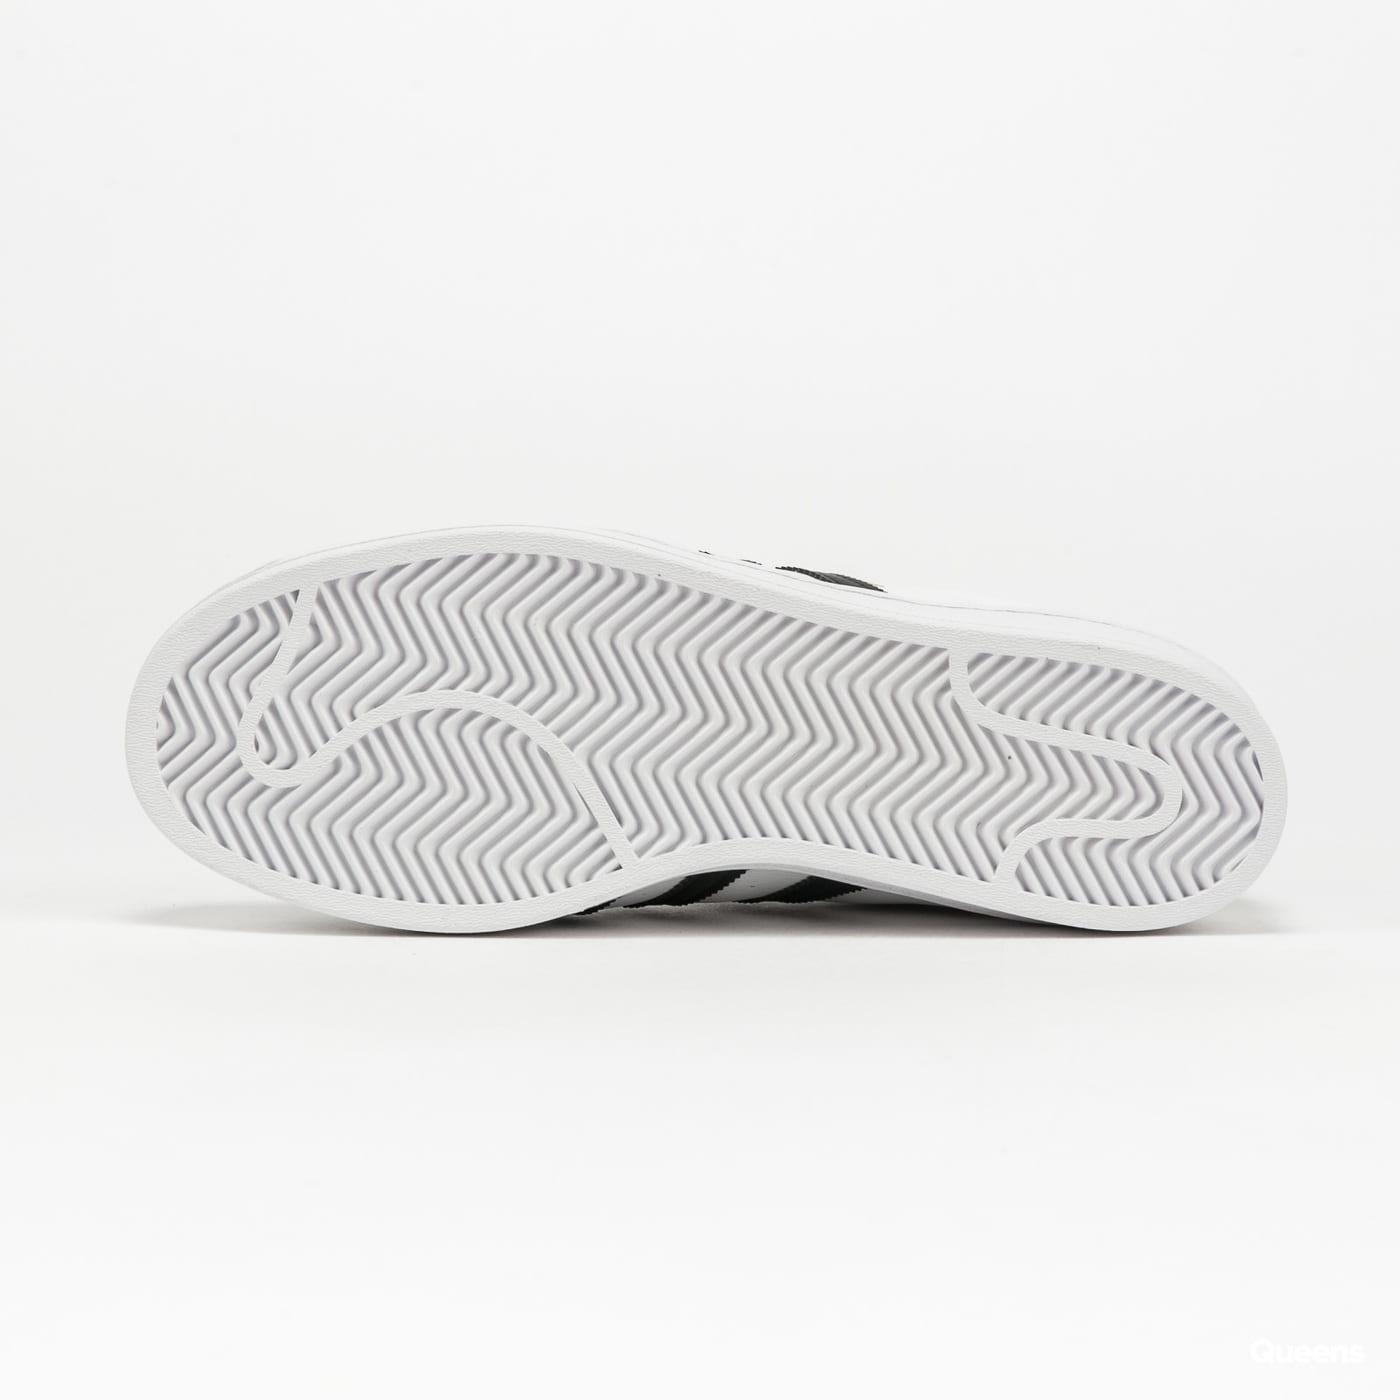 adidas Originals Superstar Vegan ftwwht / cblack / grren